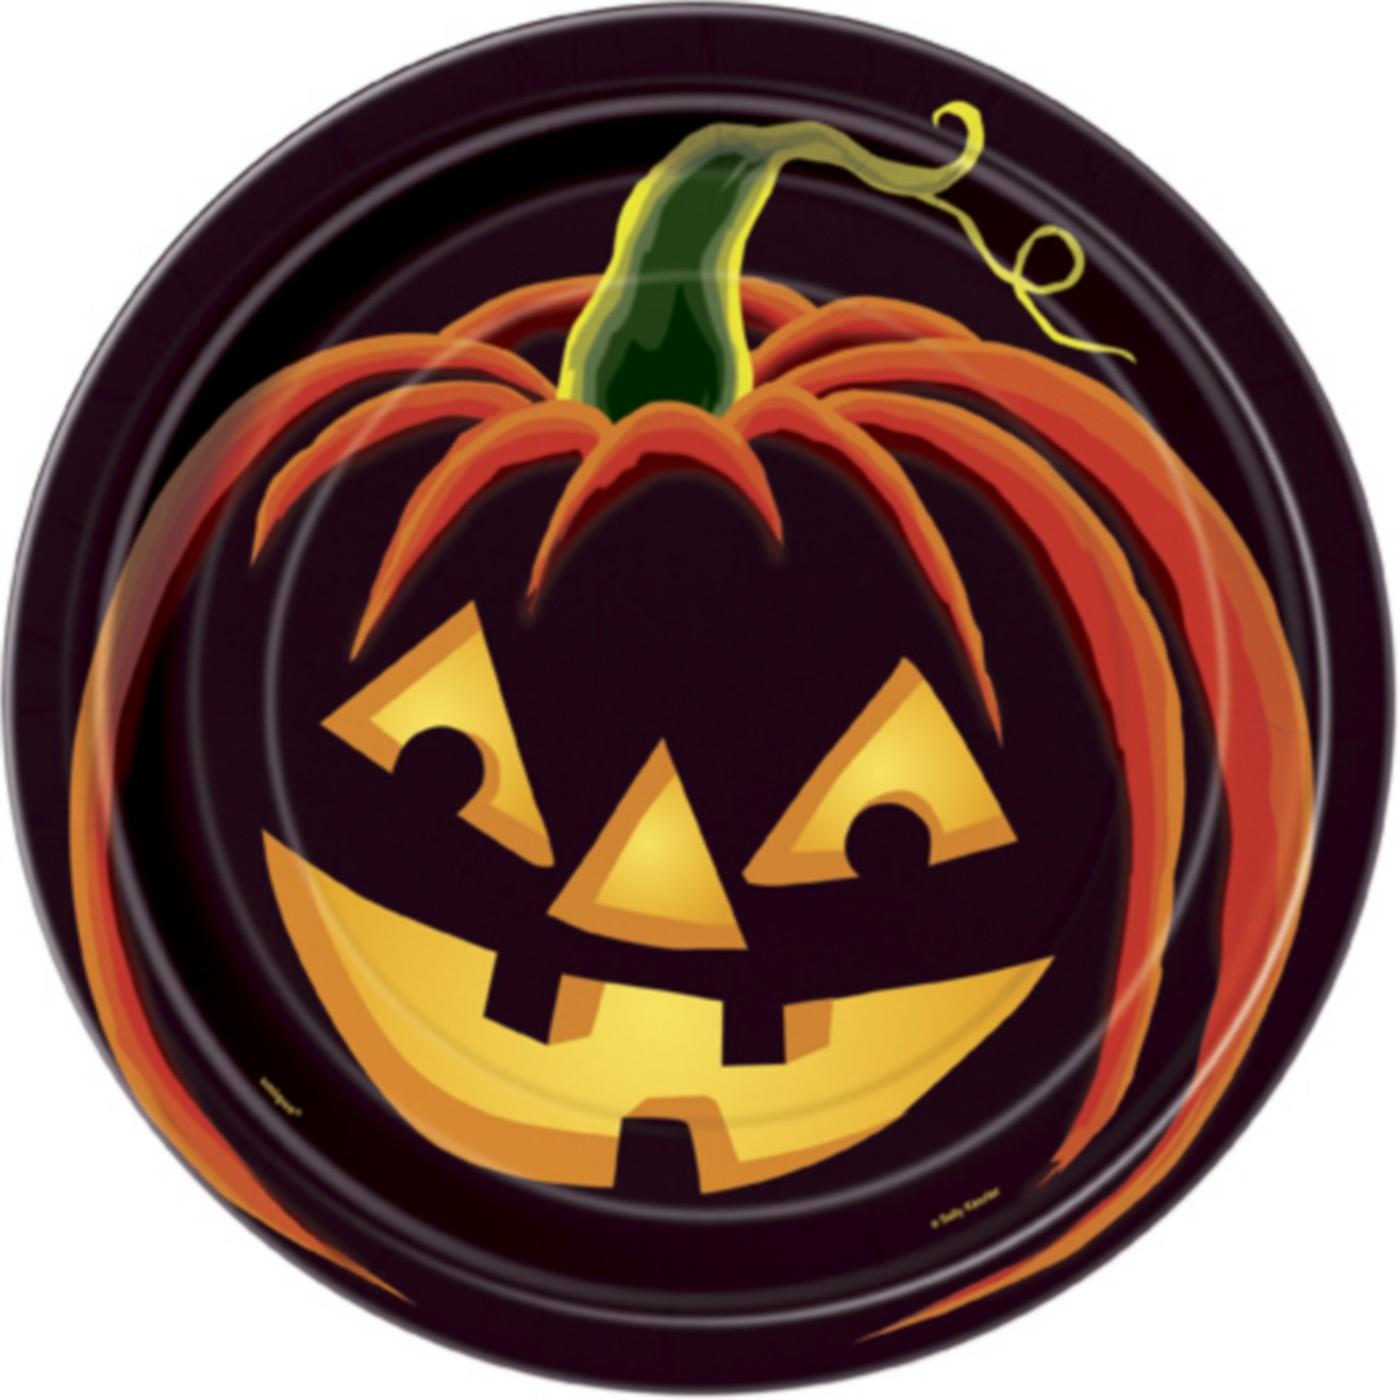 8 assiettes citrouille noire halloween - Deguisetoi fr halloween ...